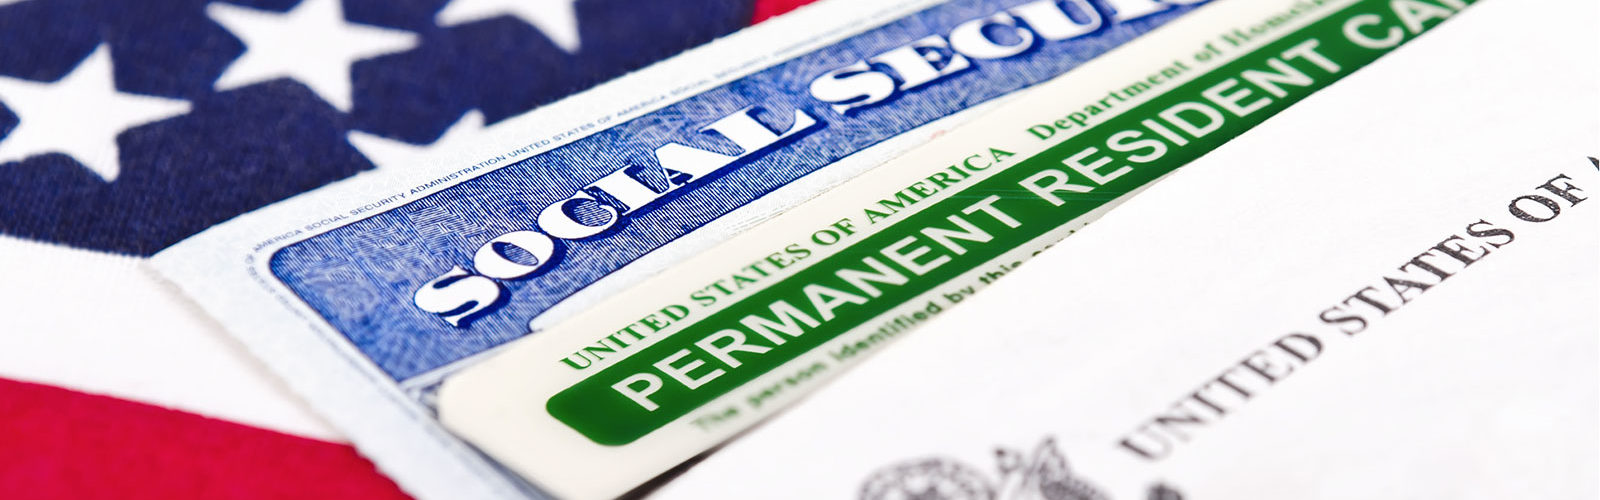 visas-green-card-investissement-talent-une